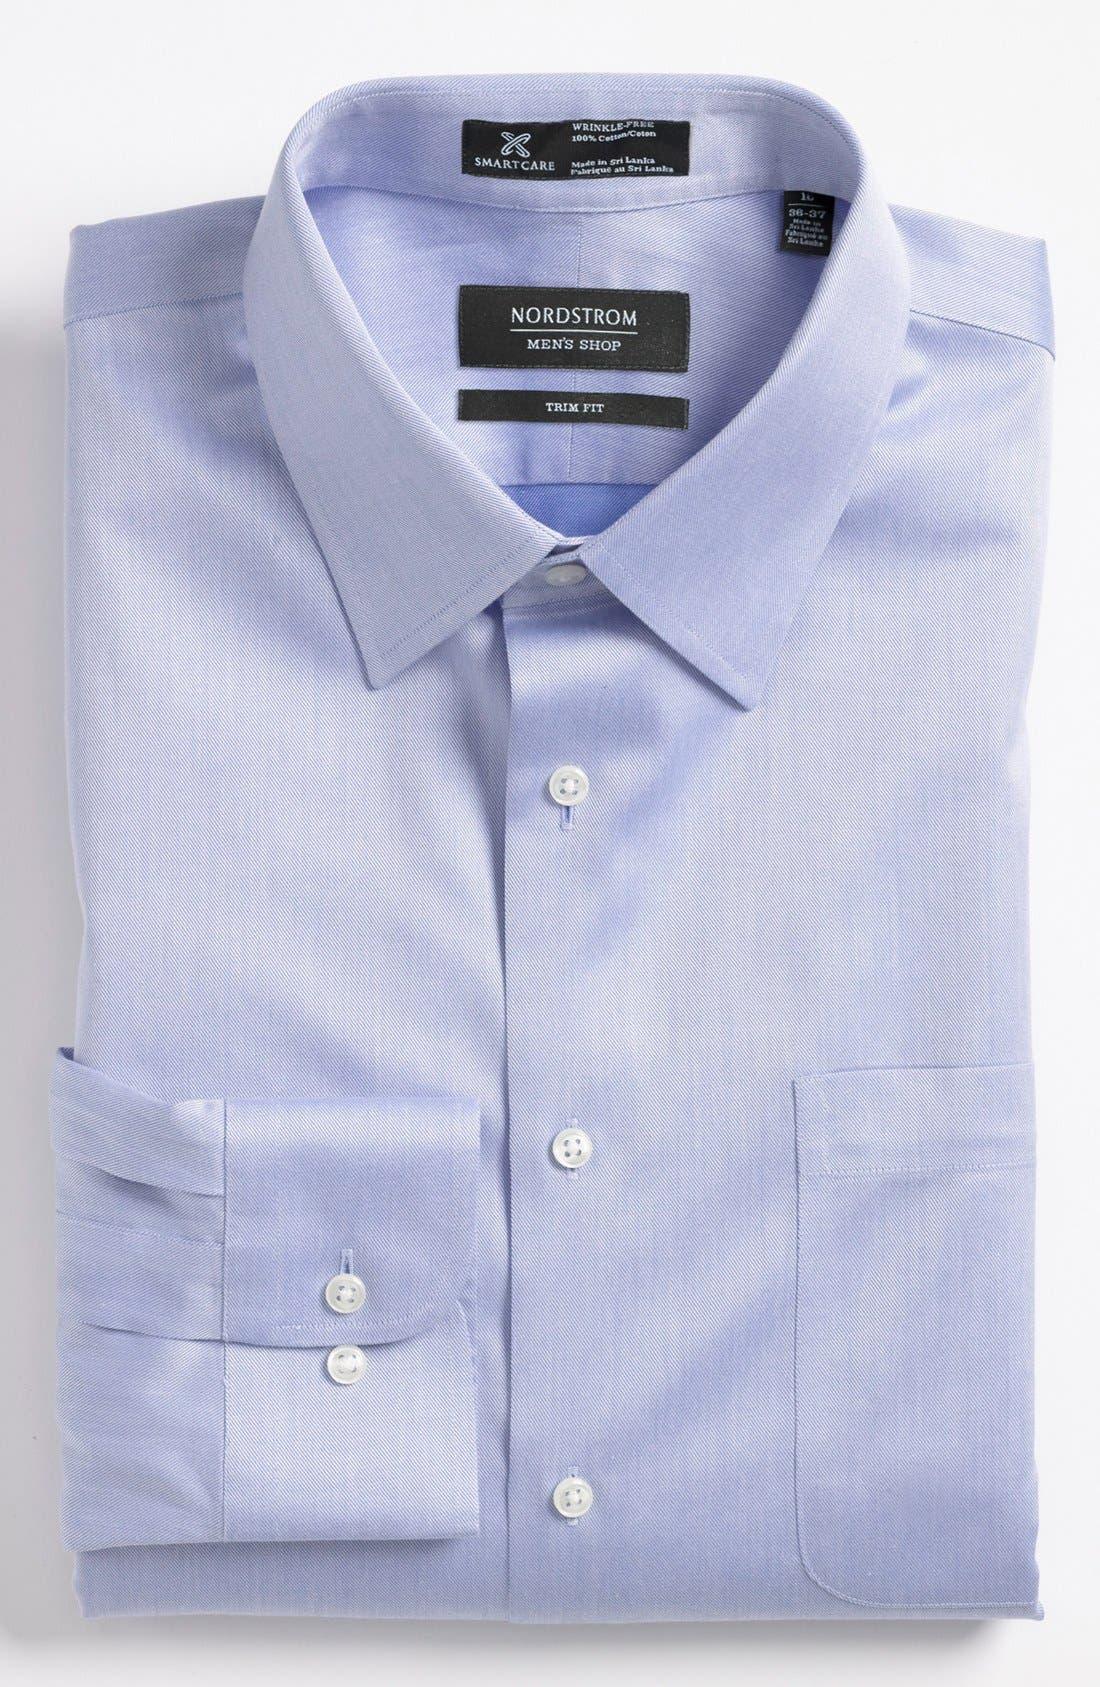 Main Image - Nordstrom Men's Shop Smartcare™ Trim Fit Twill Dress Shirt